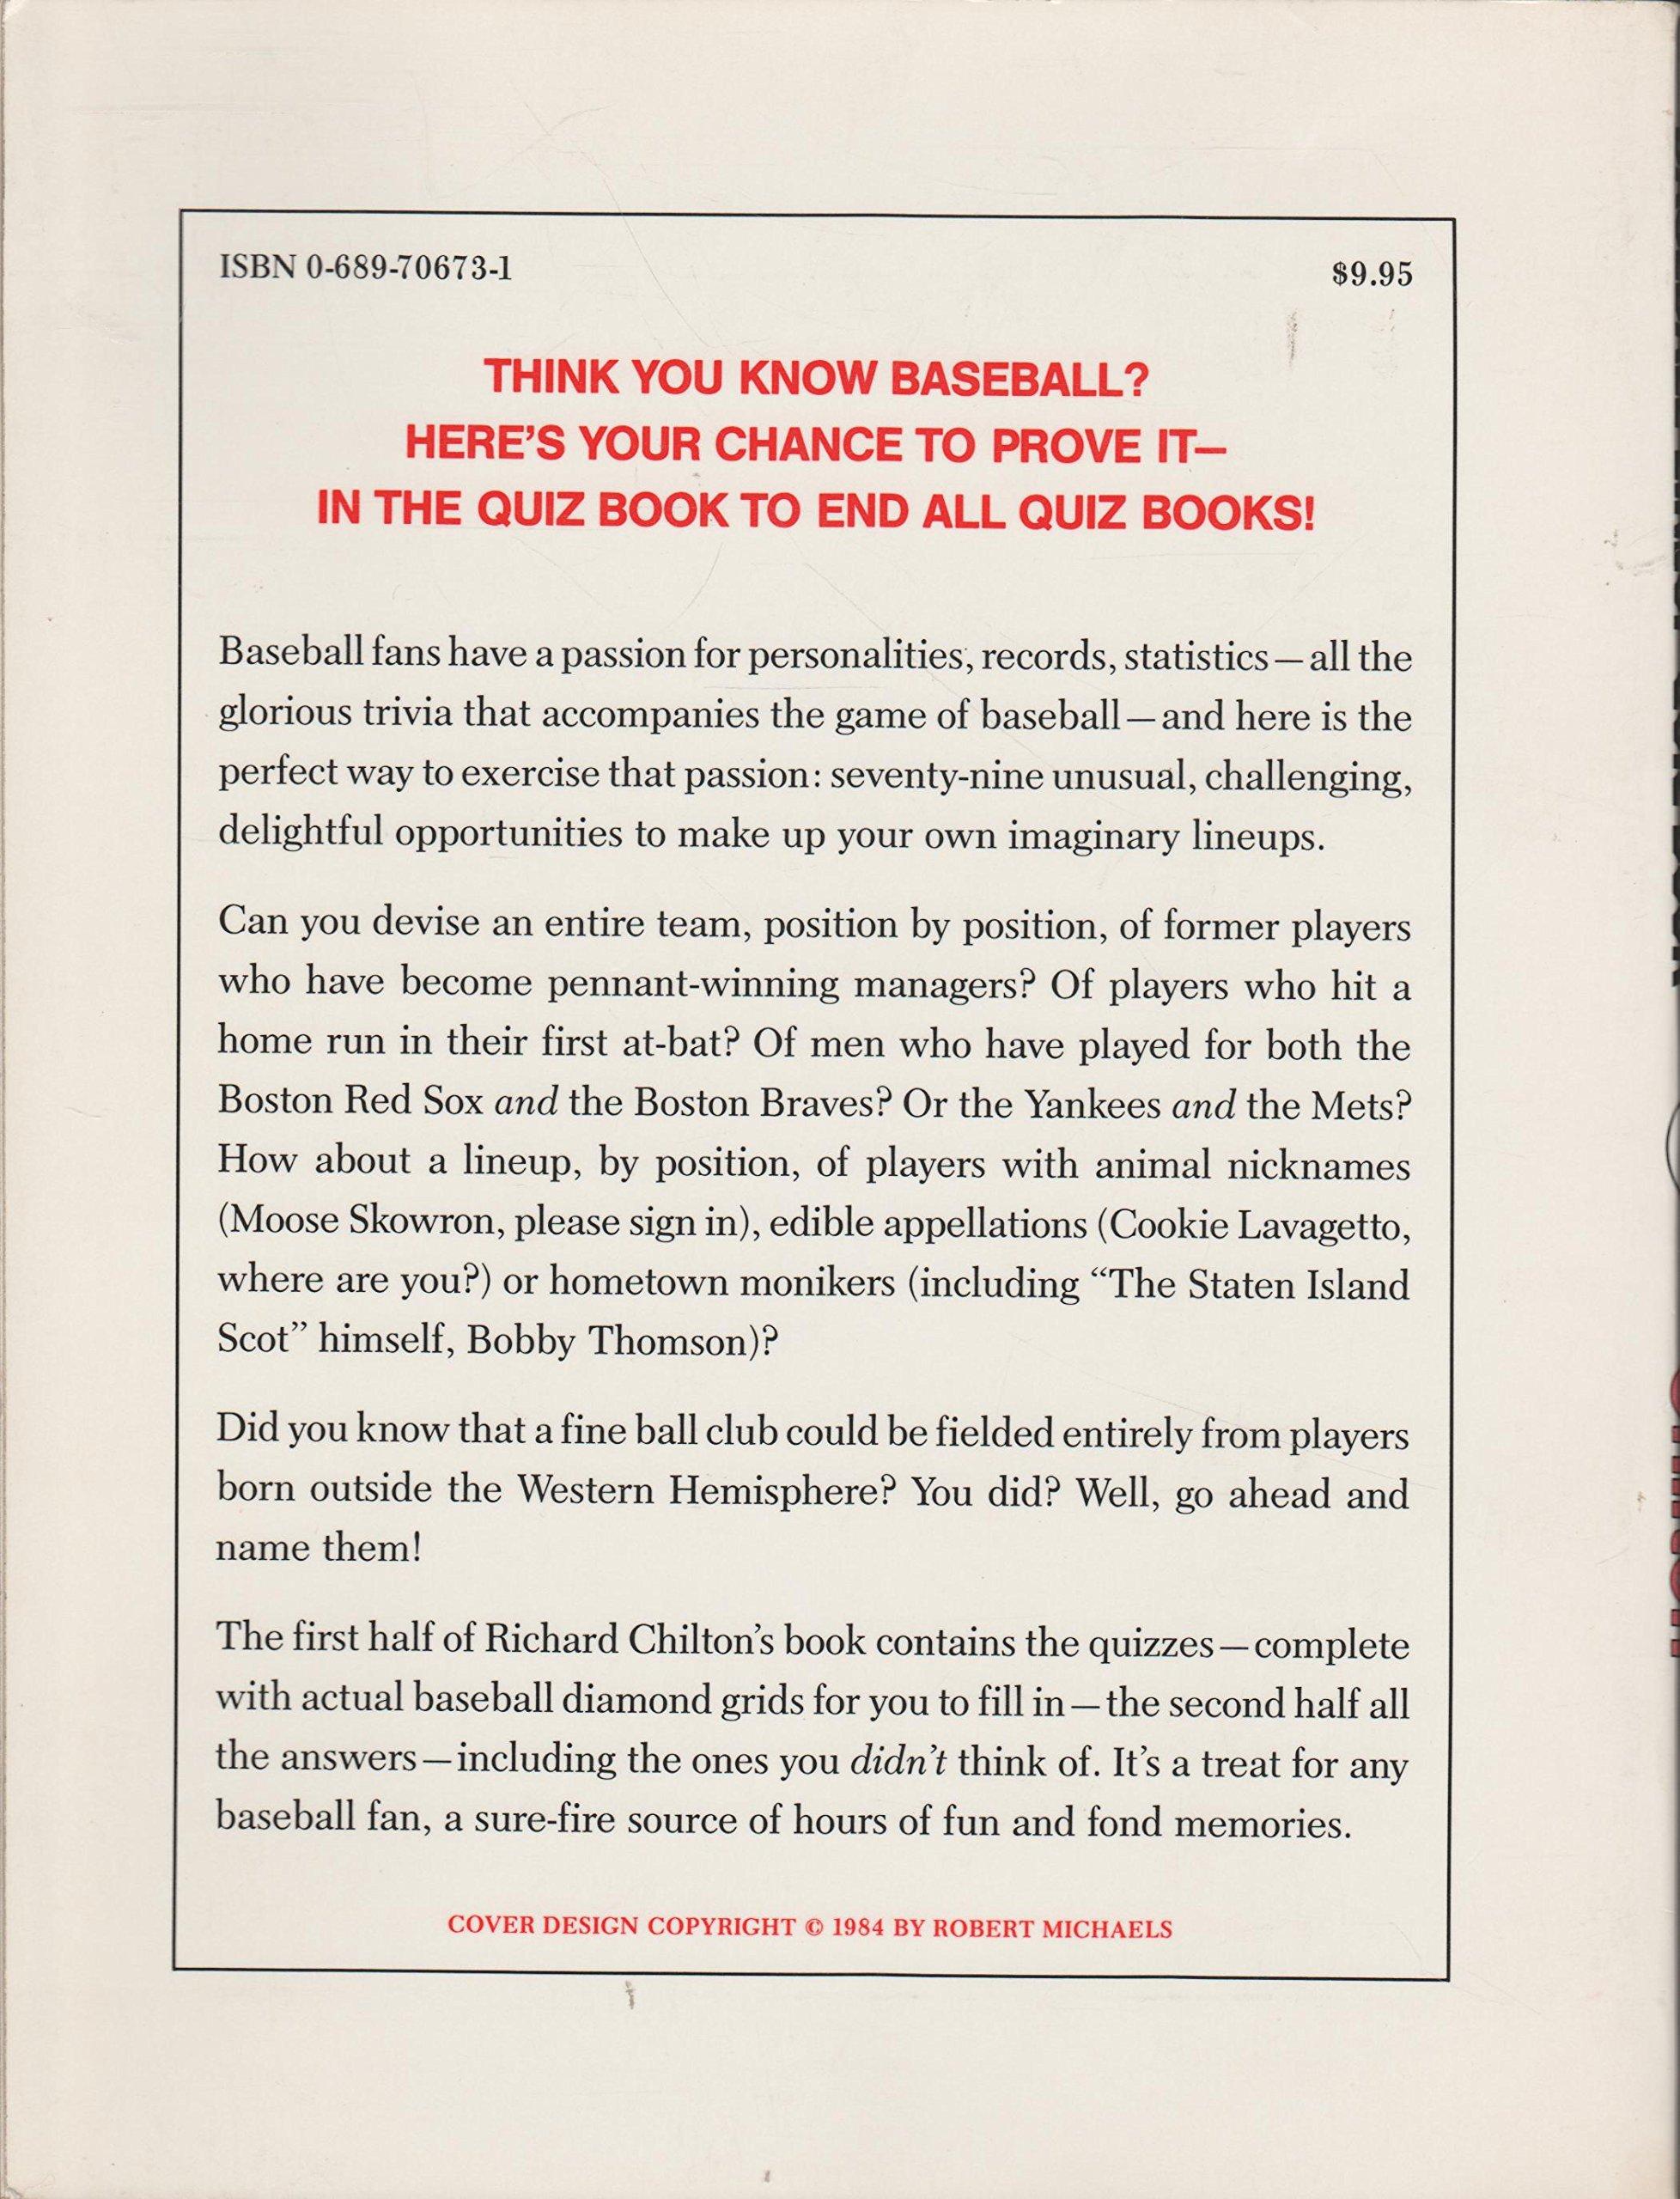 The great American baseball lineup quiz book: Richard L Chilton